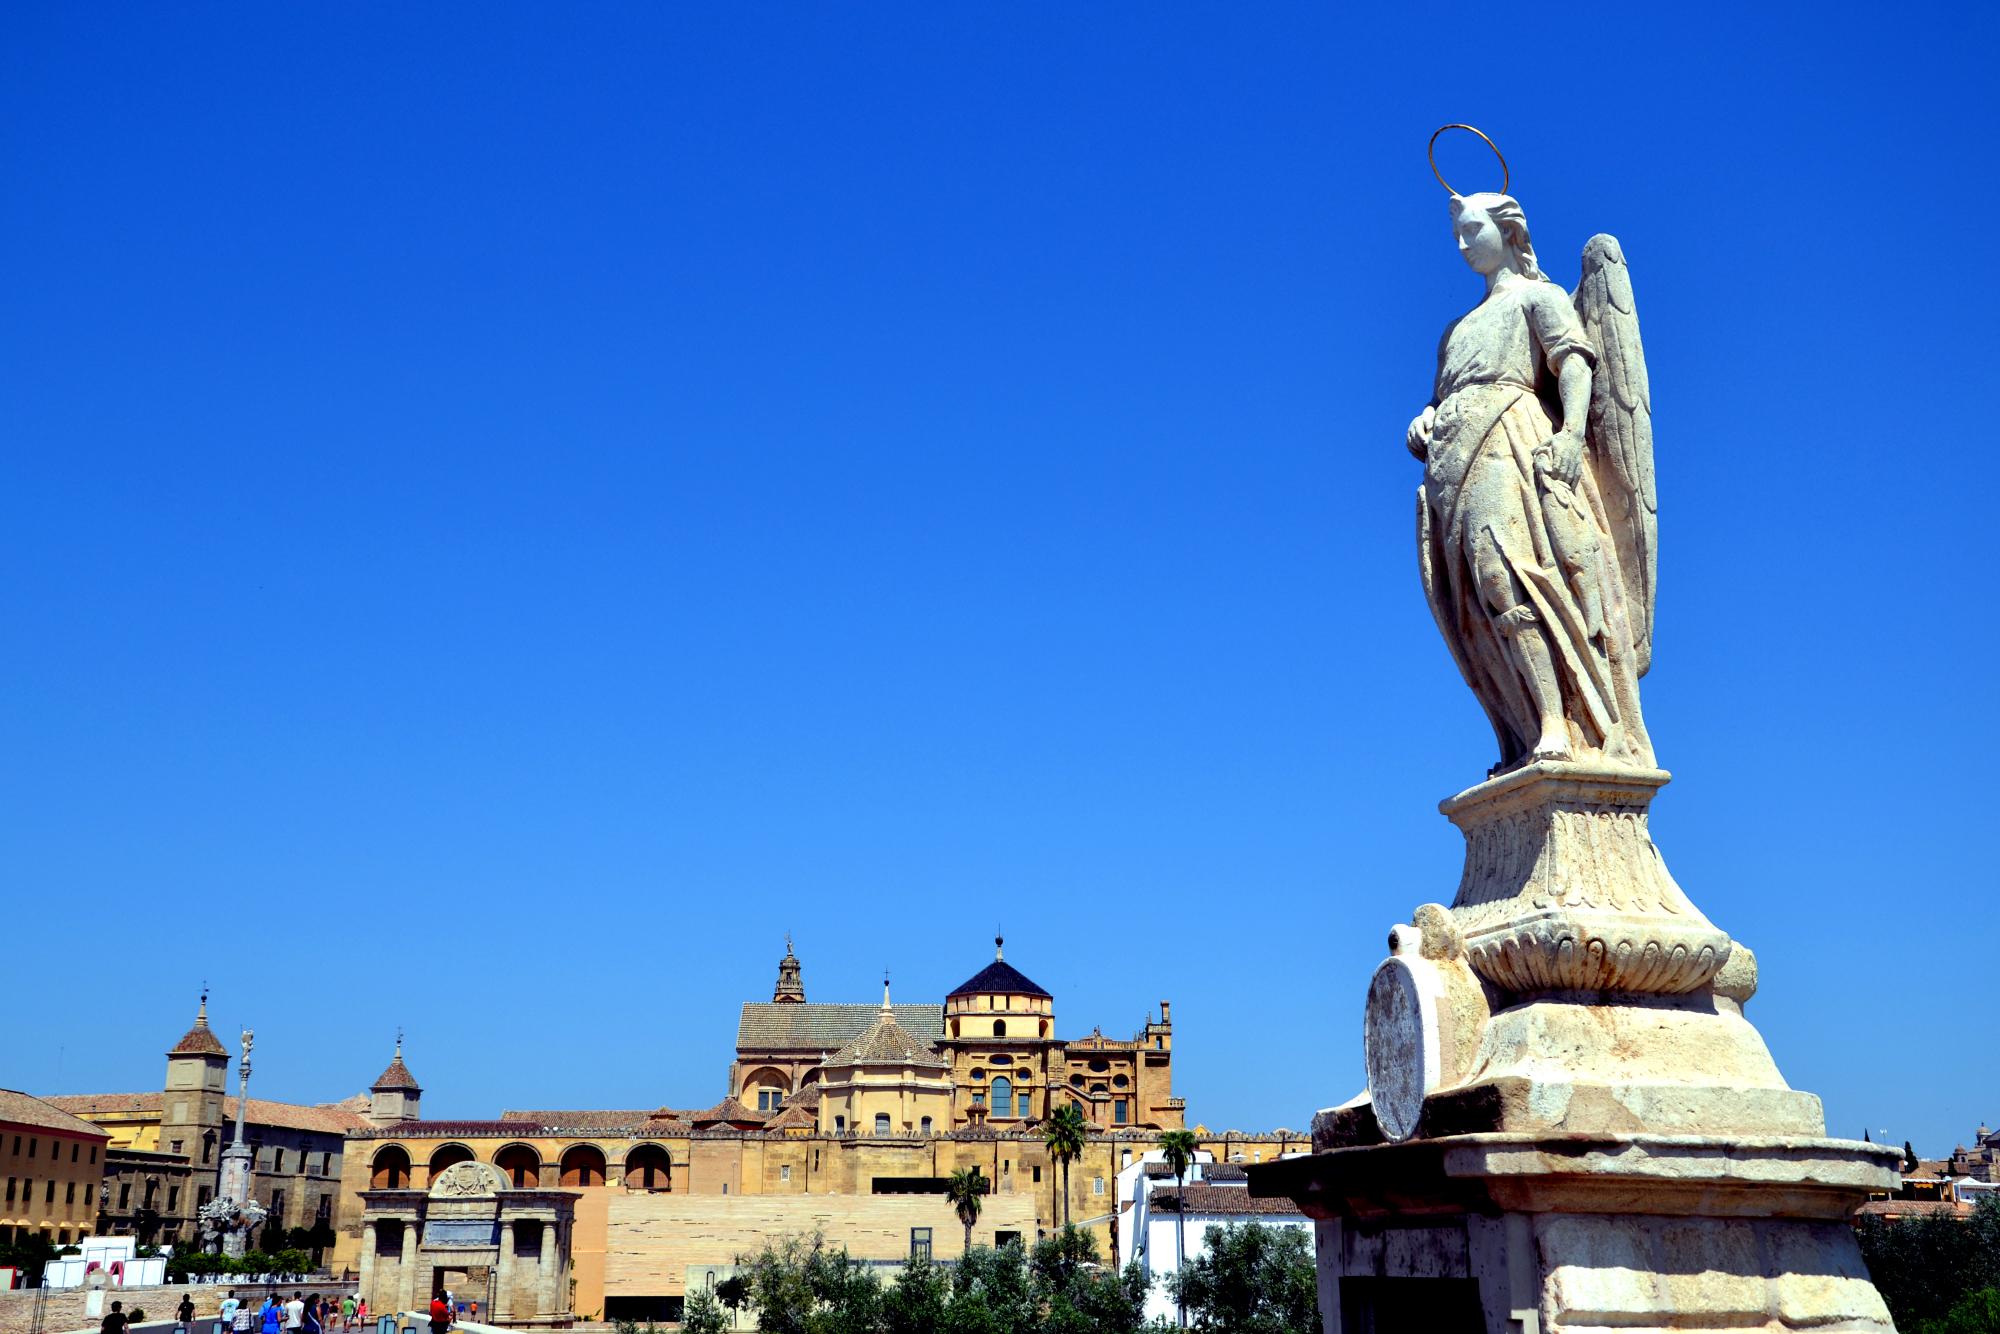 Статуя Архангела Рафаэля / Римский Мост в Кордове фото: Mundo-Guides